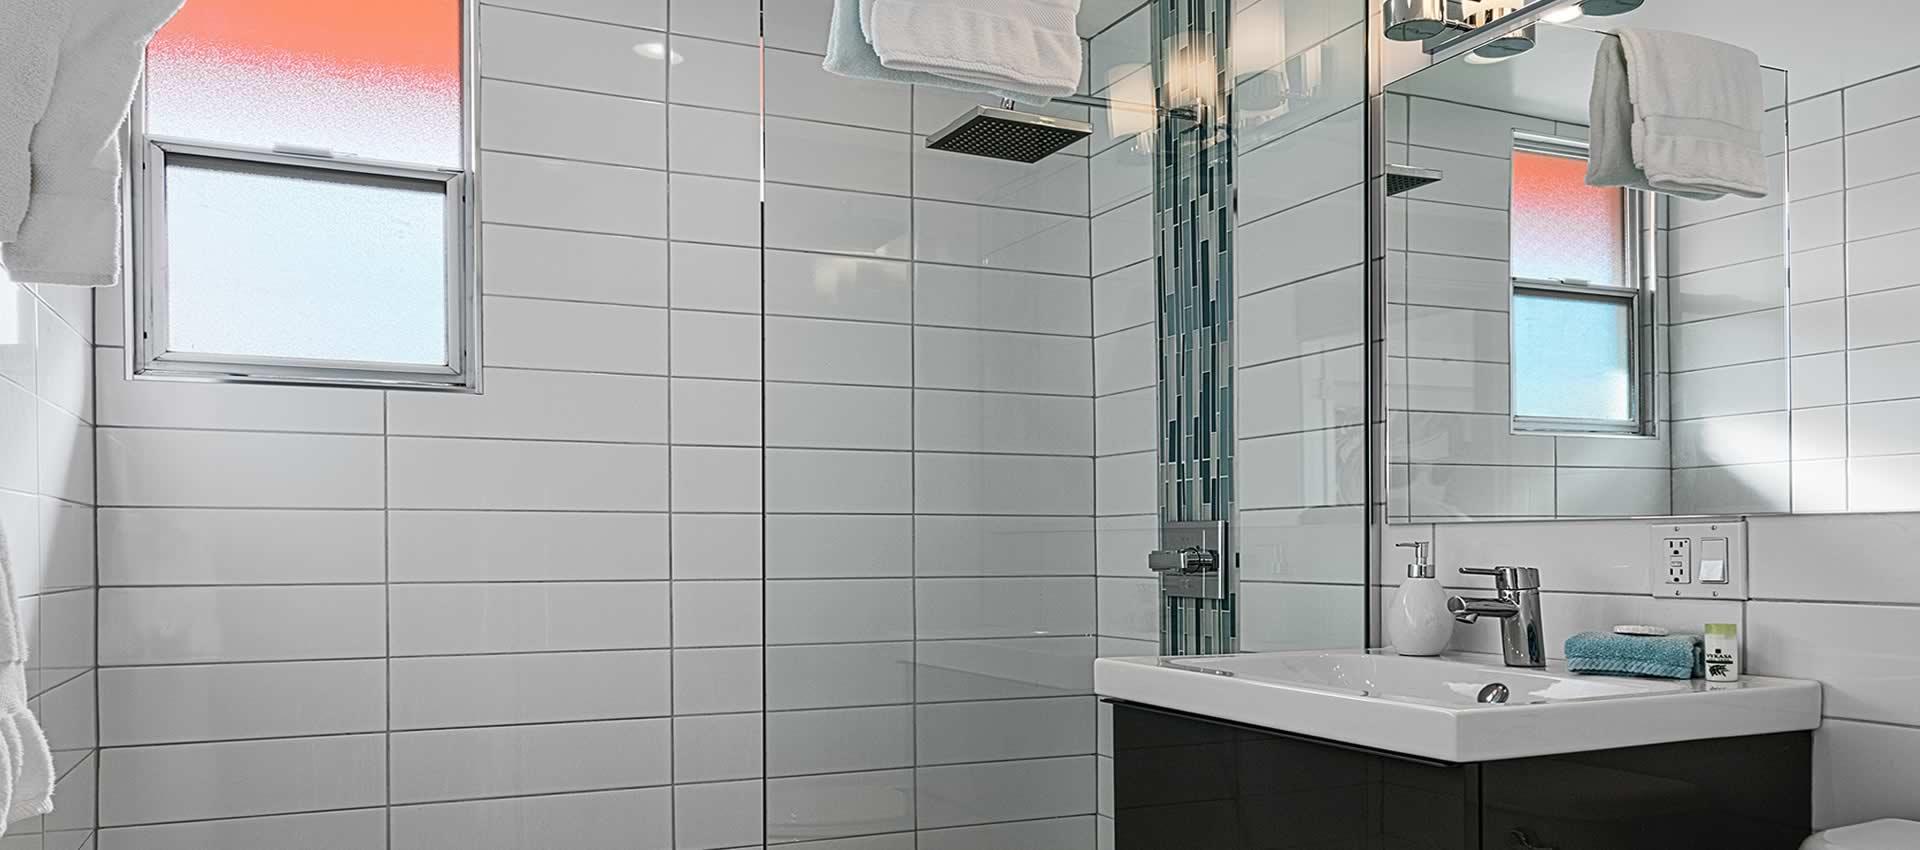 twist hotel bathroom shower white tile